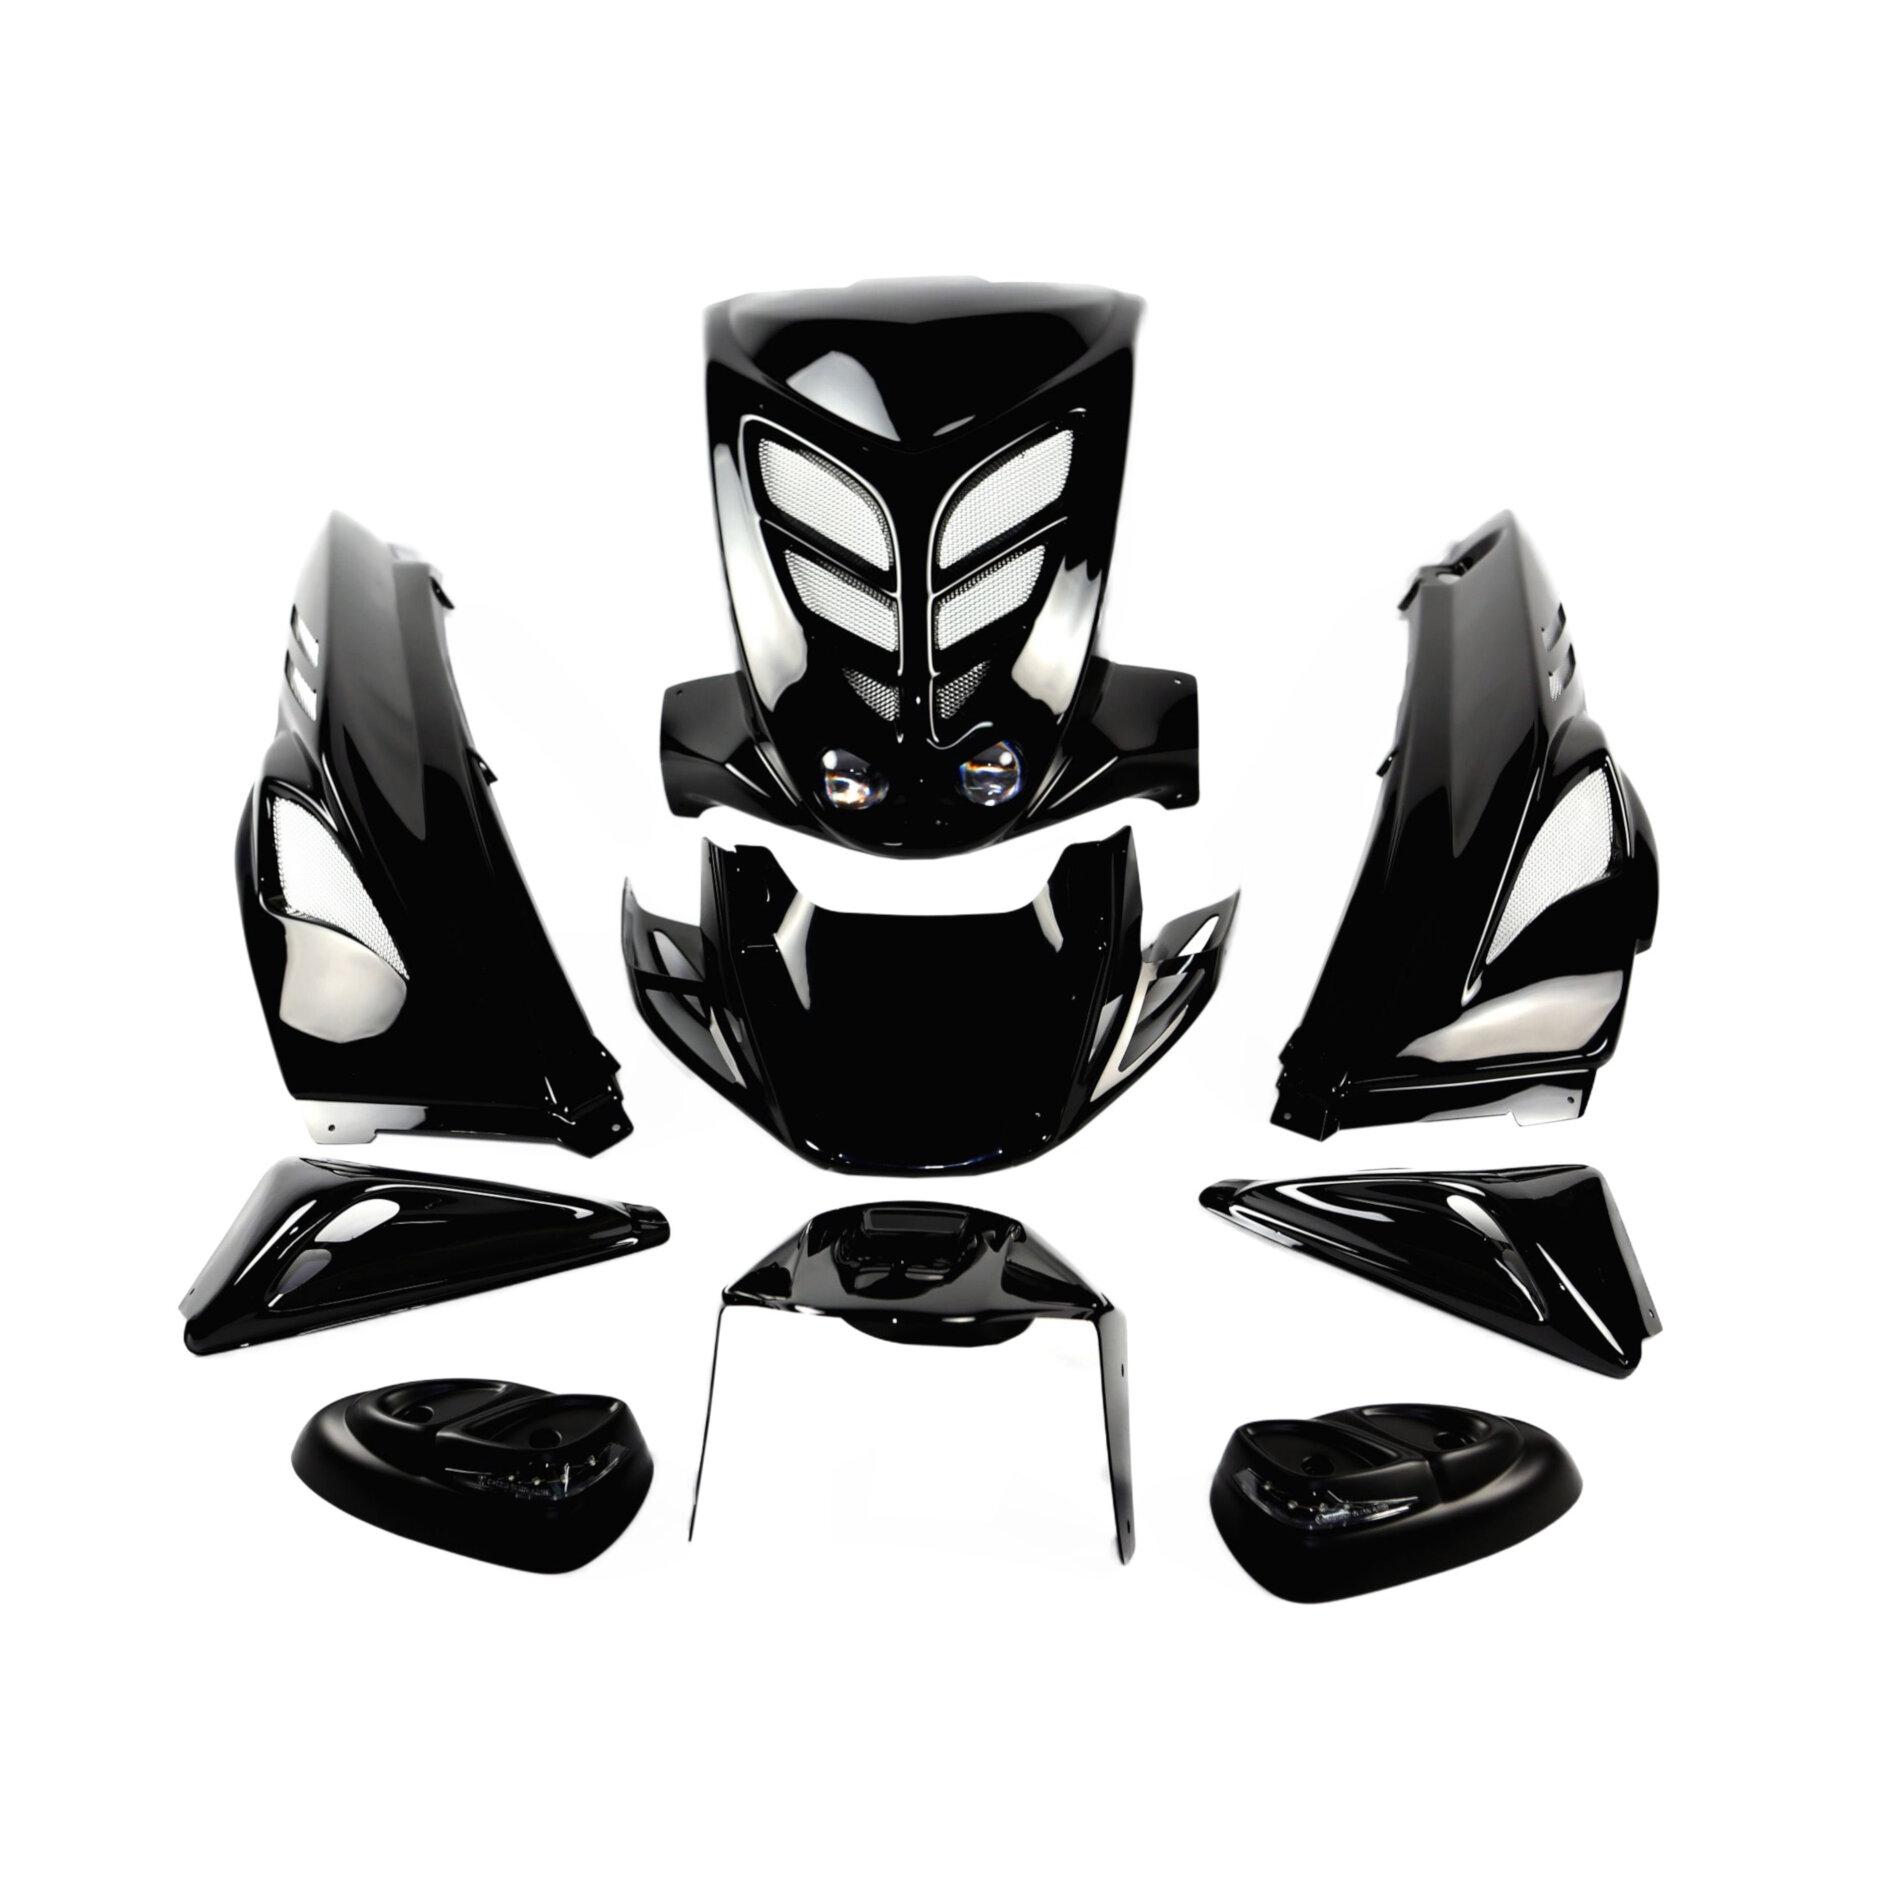 Kit carrosserie BCD 9 pièces MBK Stunt / Yamaha Slider - Blanc